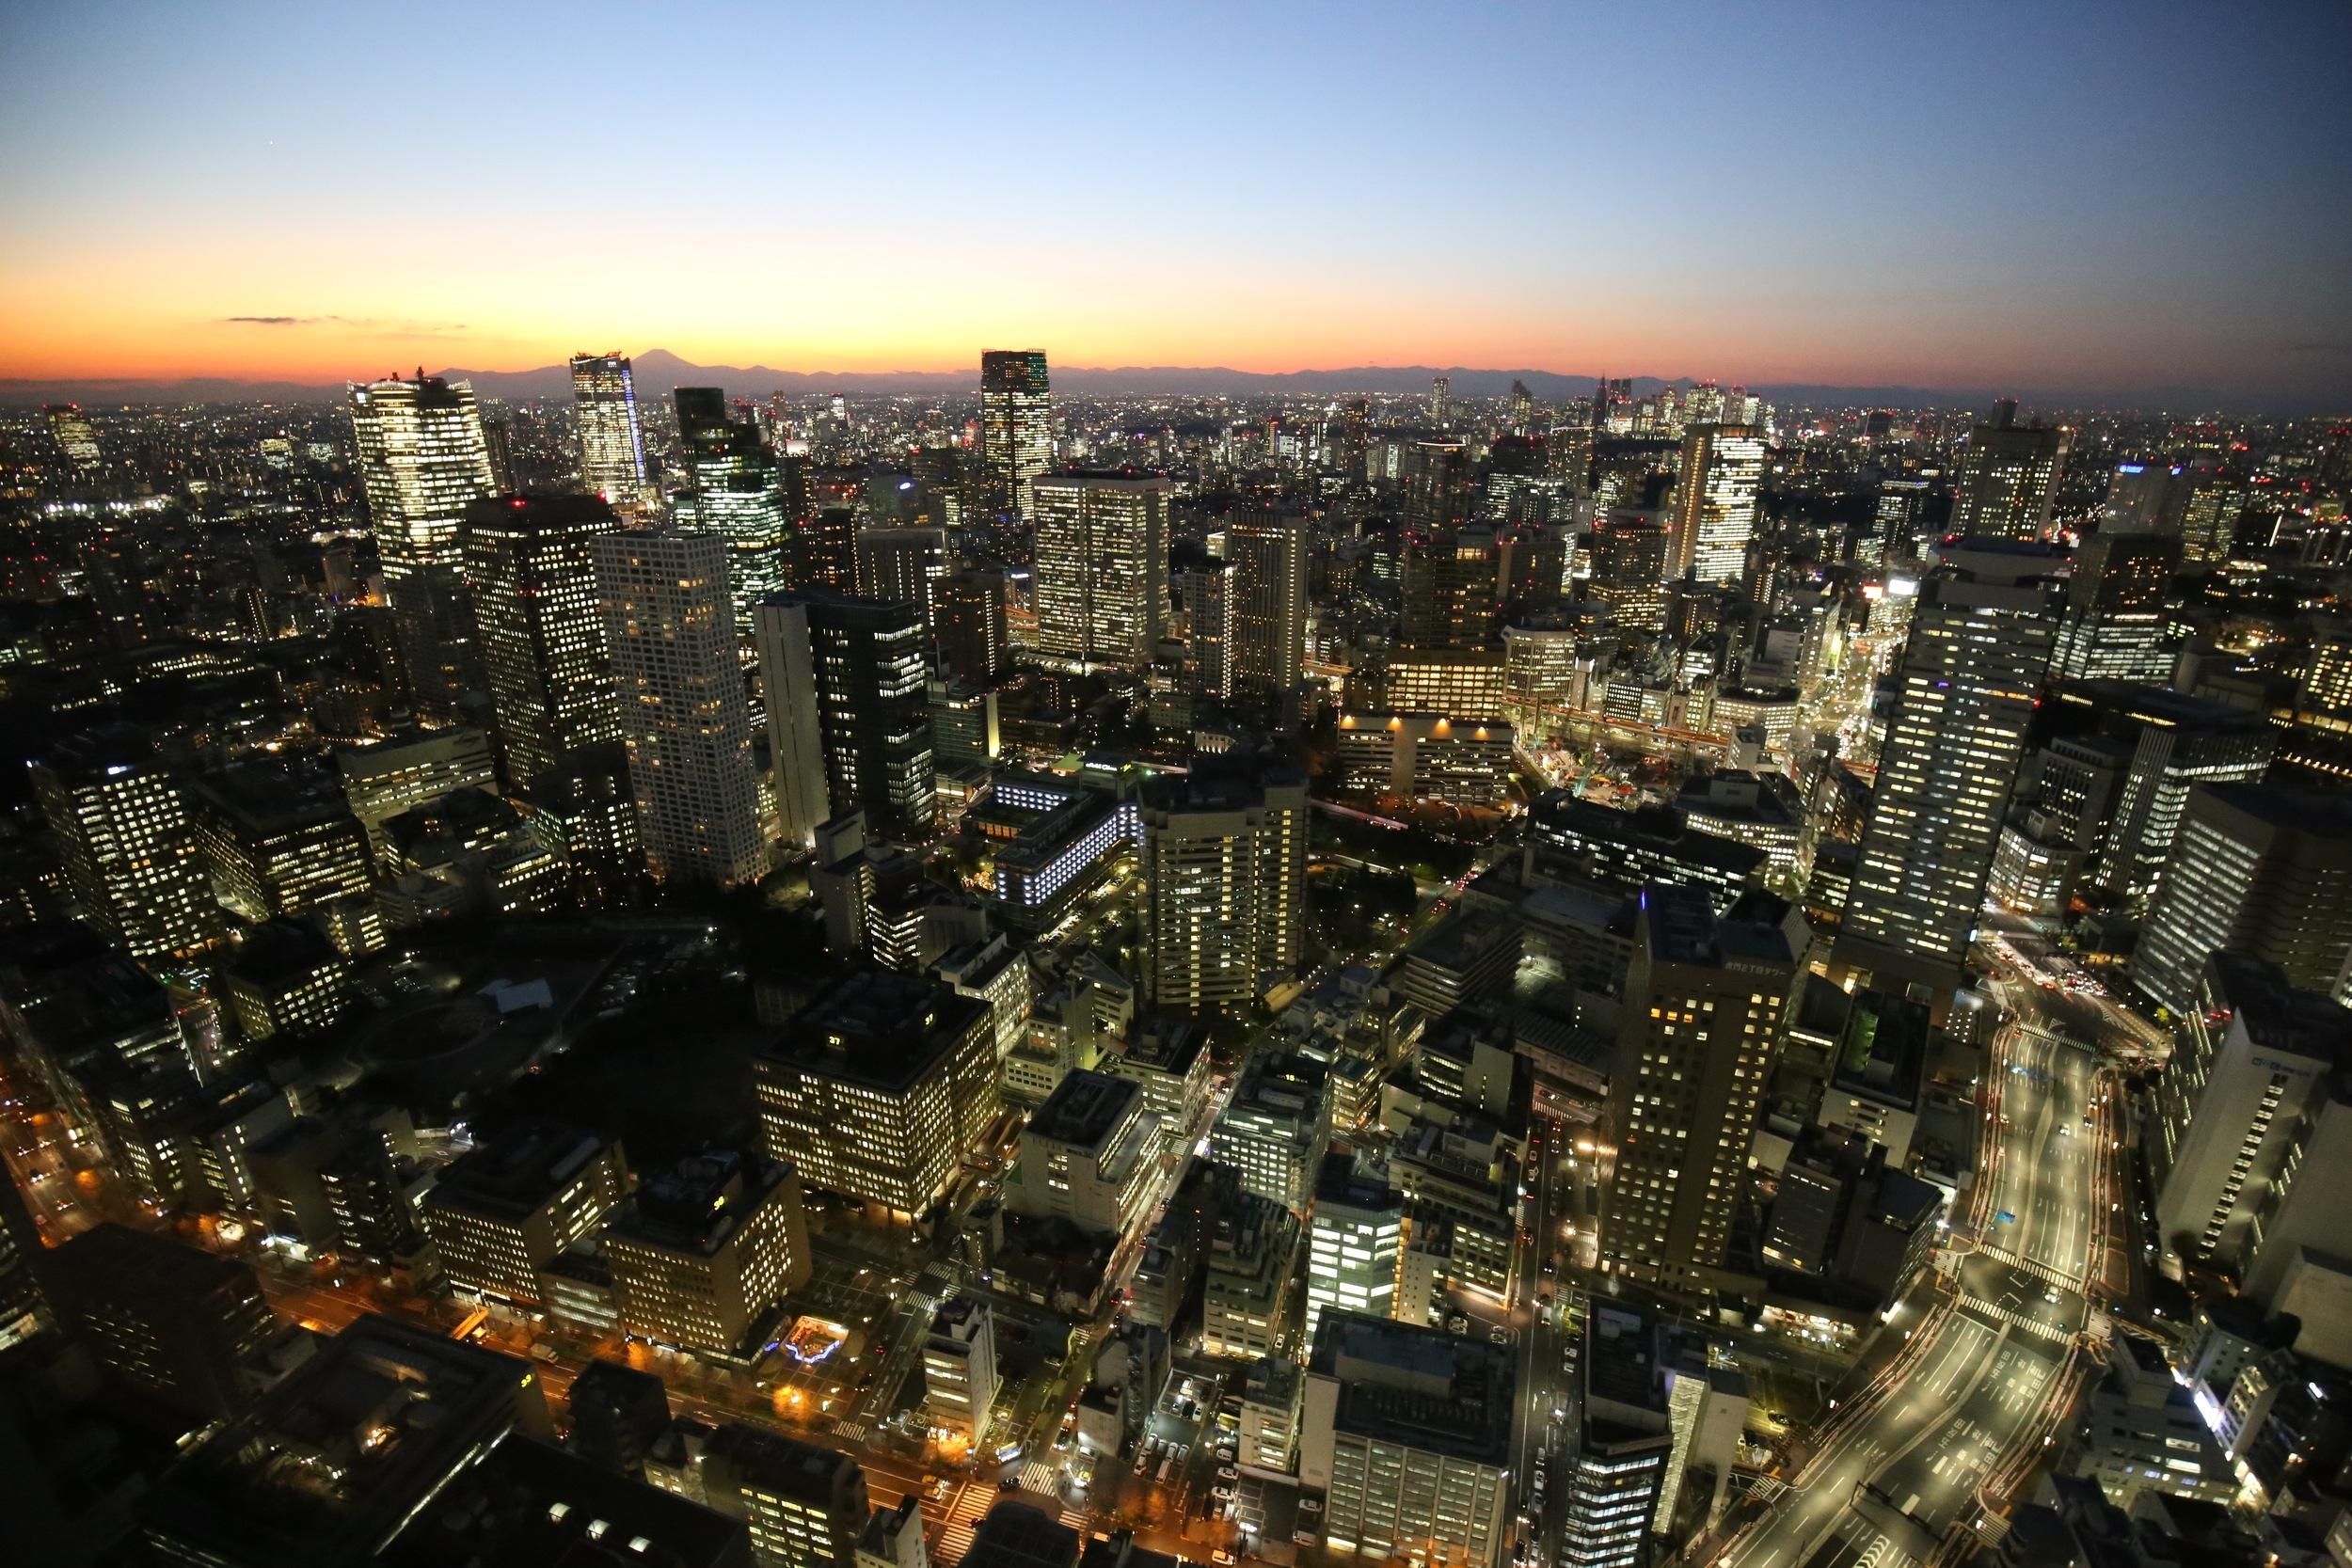 View from the Andaz Hotel, Taranomon Hills, Tokyo